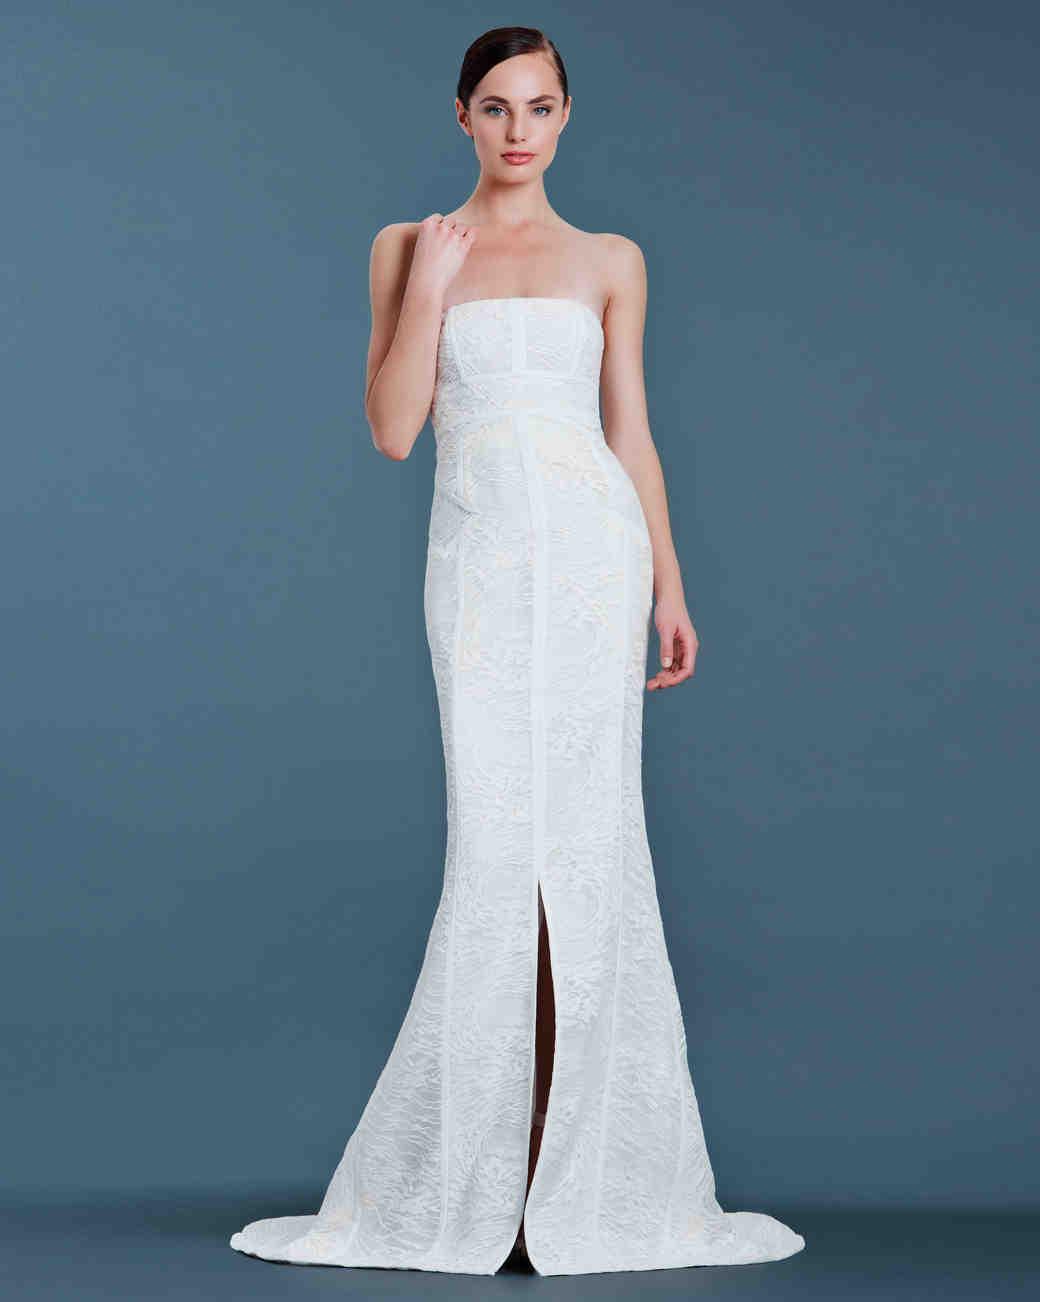 Fine Where To Buy Inbal Dror Wedding Dresses Pattern - All Wedding ...